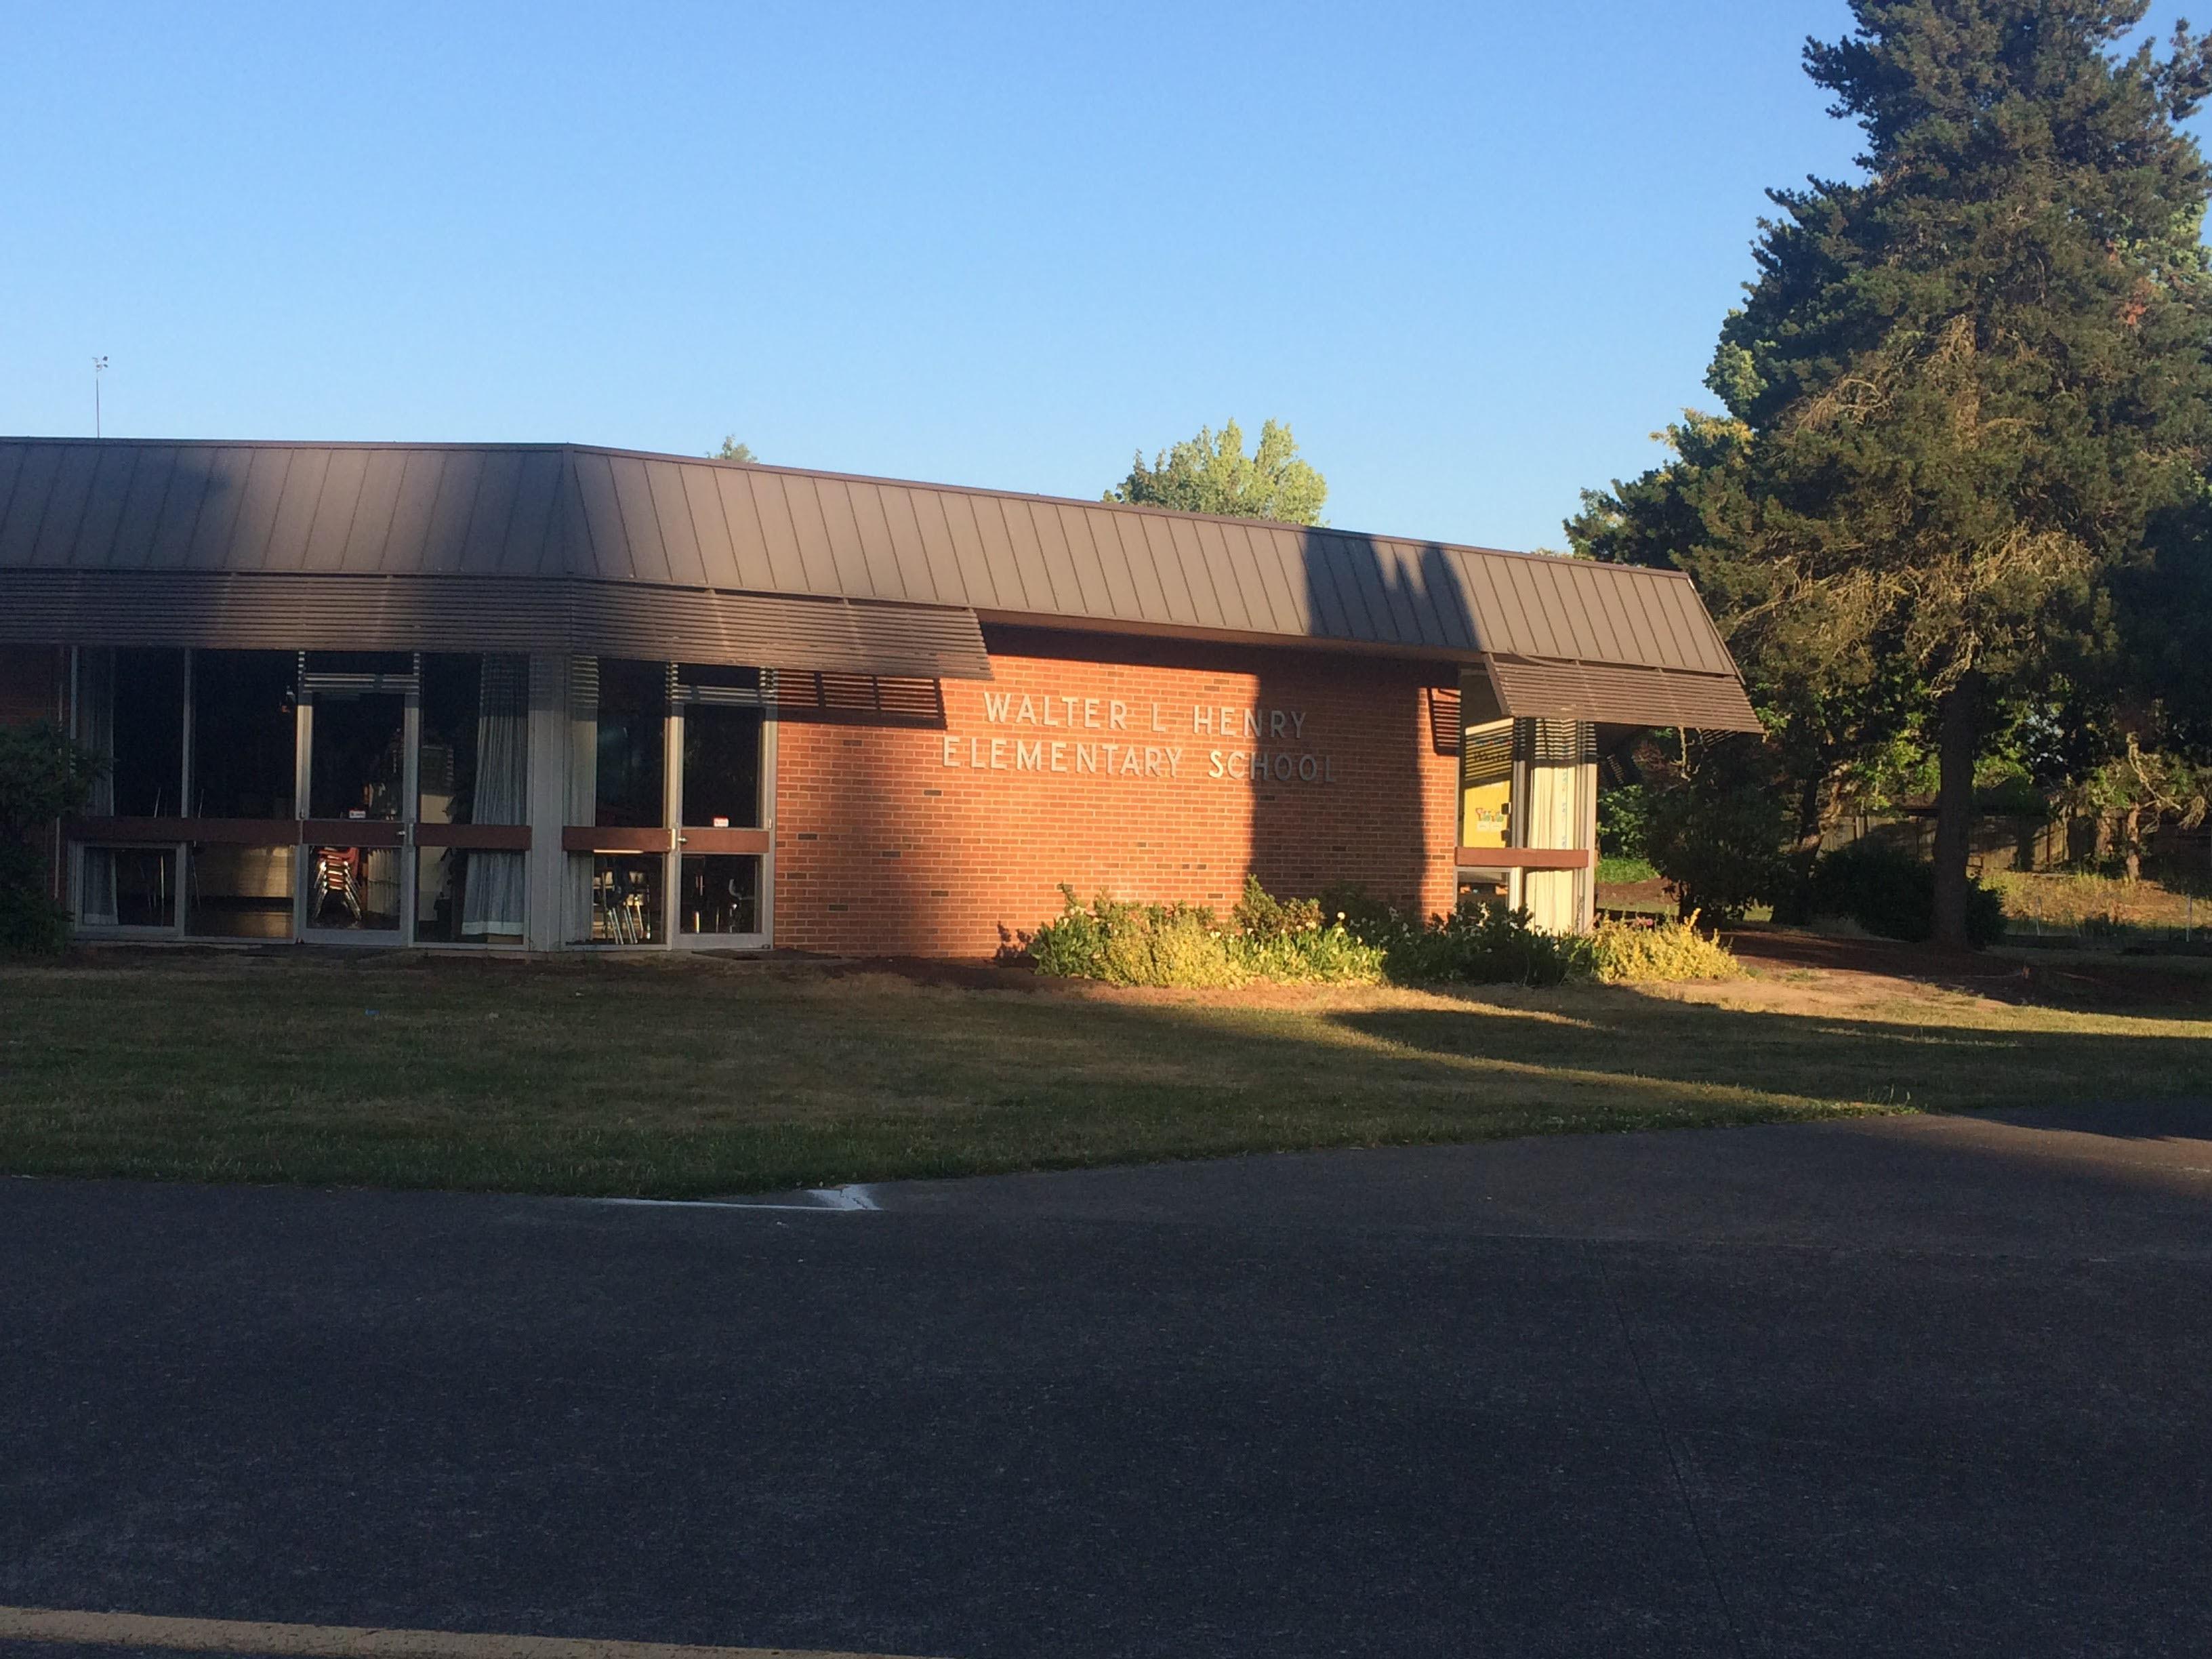 Walter Henry Elementary School (Beaverton, Oregon) Homes for Sale